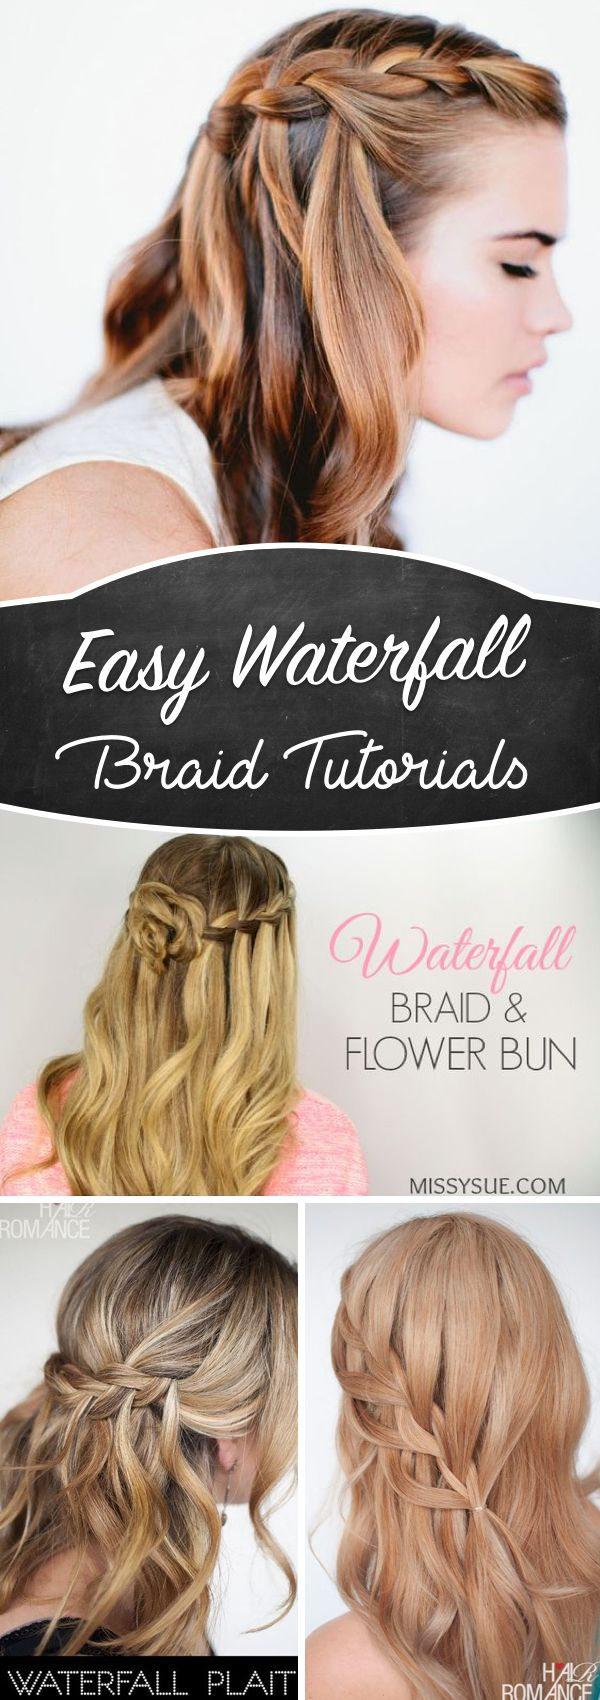 Waterfall Braid Tutorials Adding Beautiful Twists and Turns to